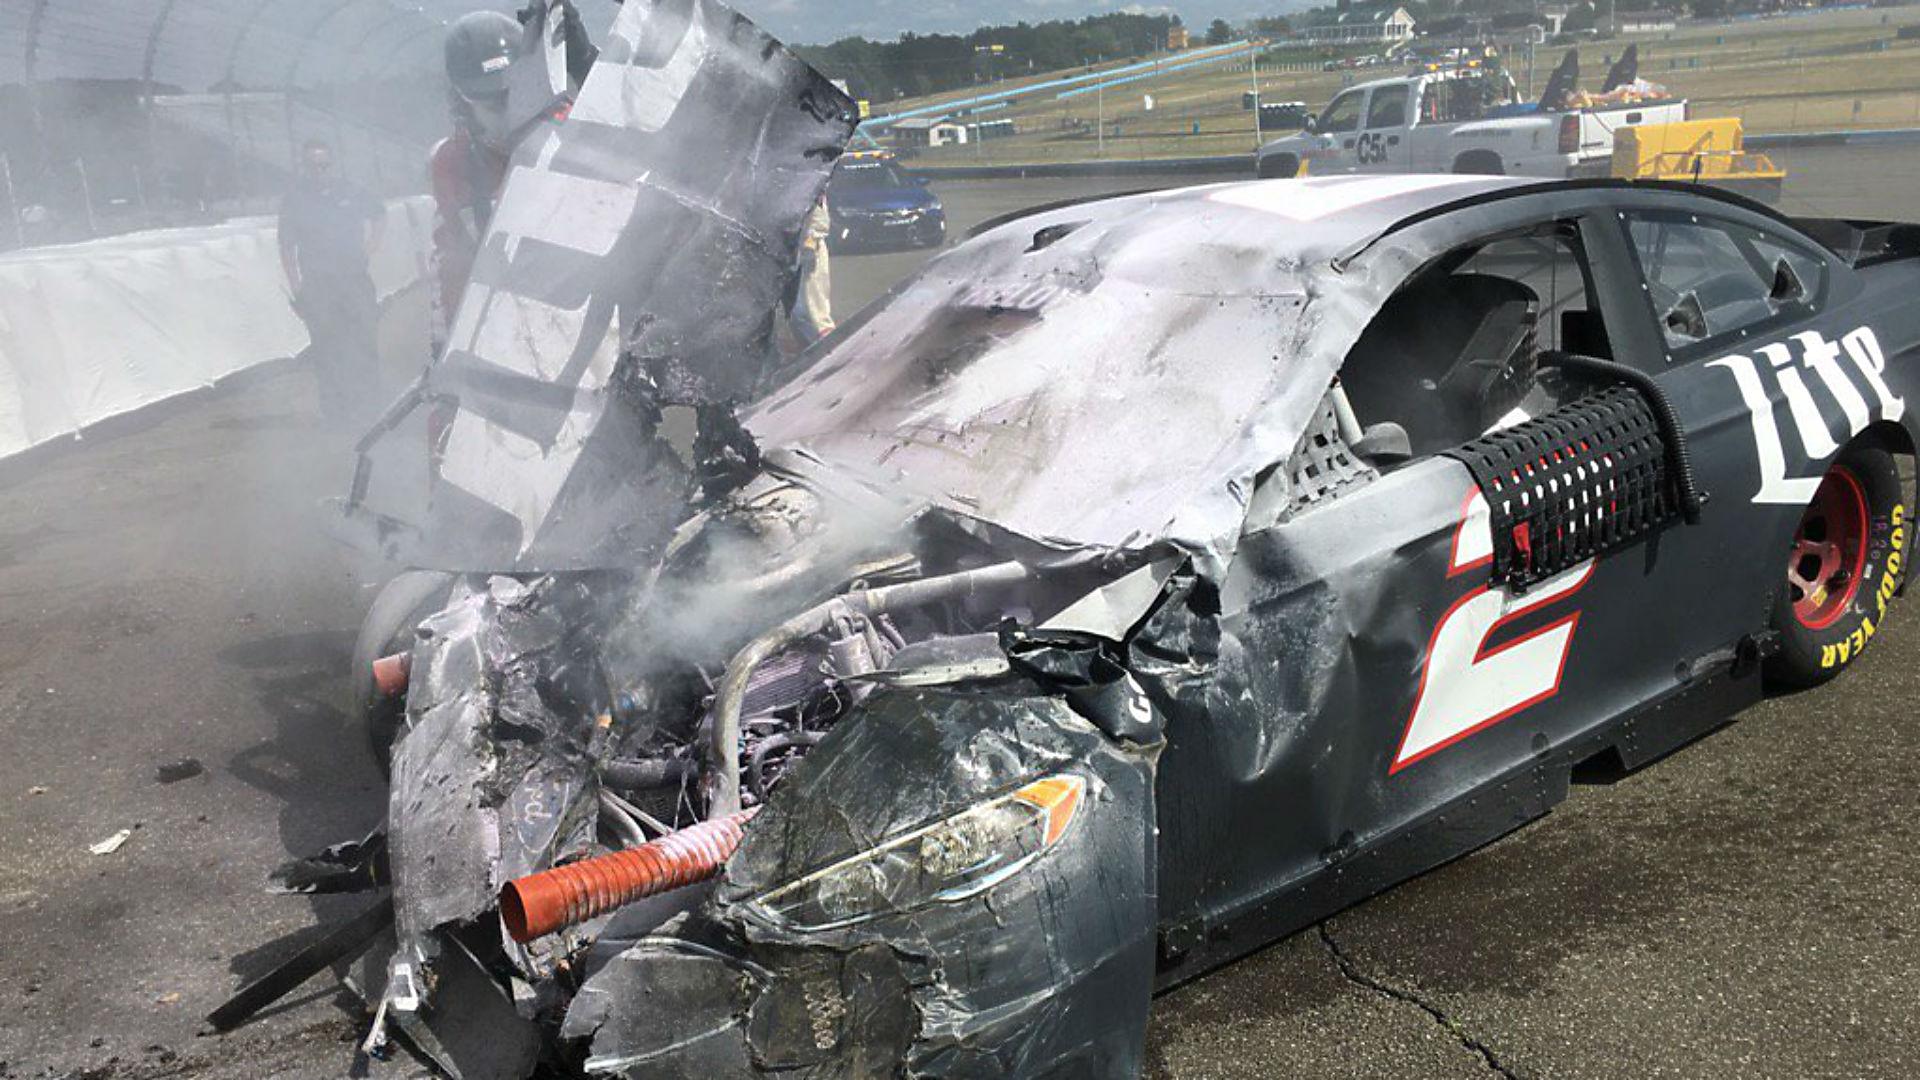 Brad Keselowski Destroys Car In Vicious Crash At Watkins Glen